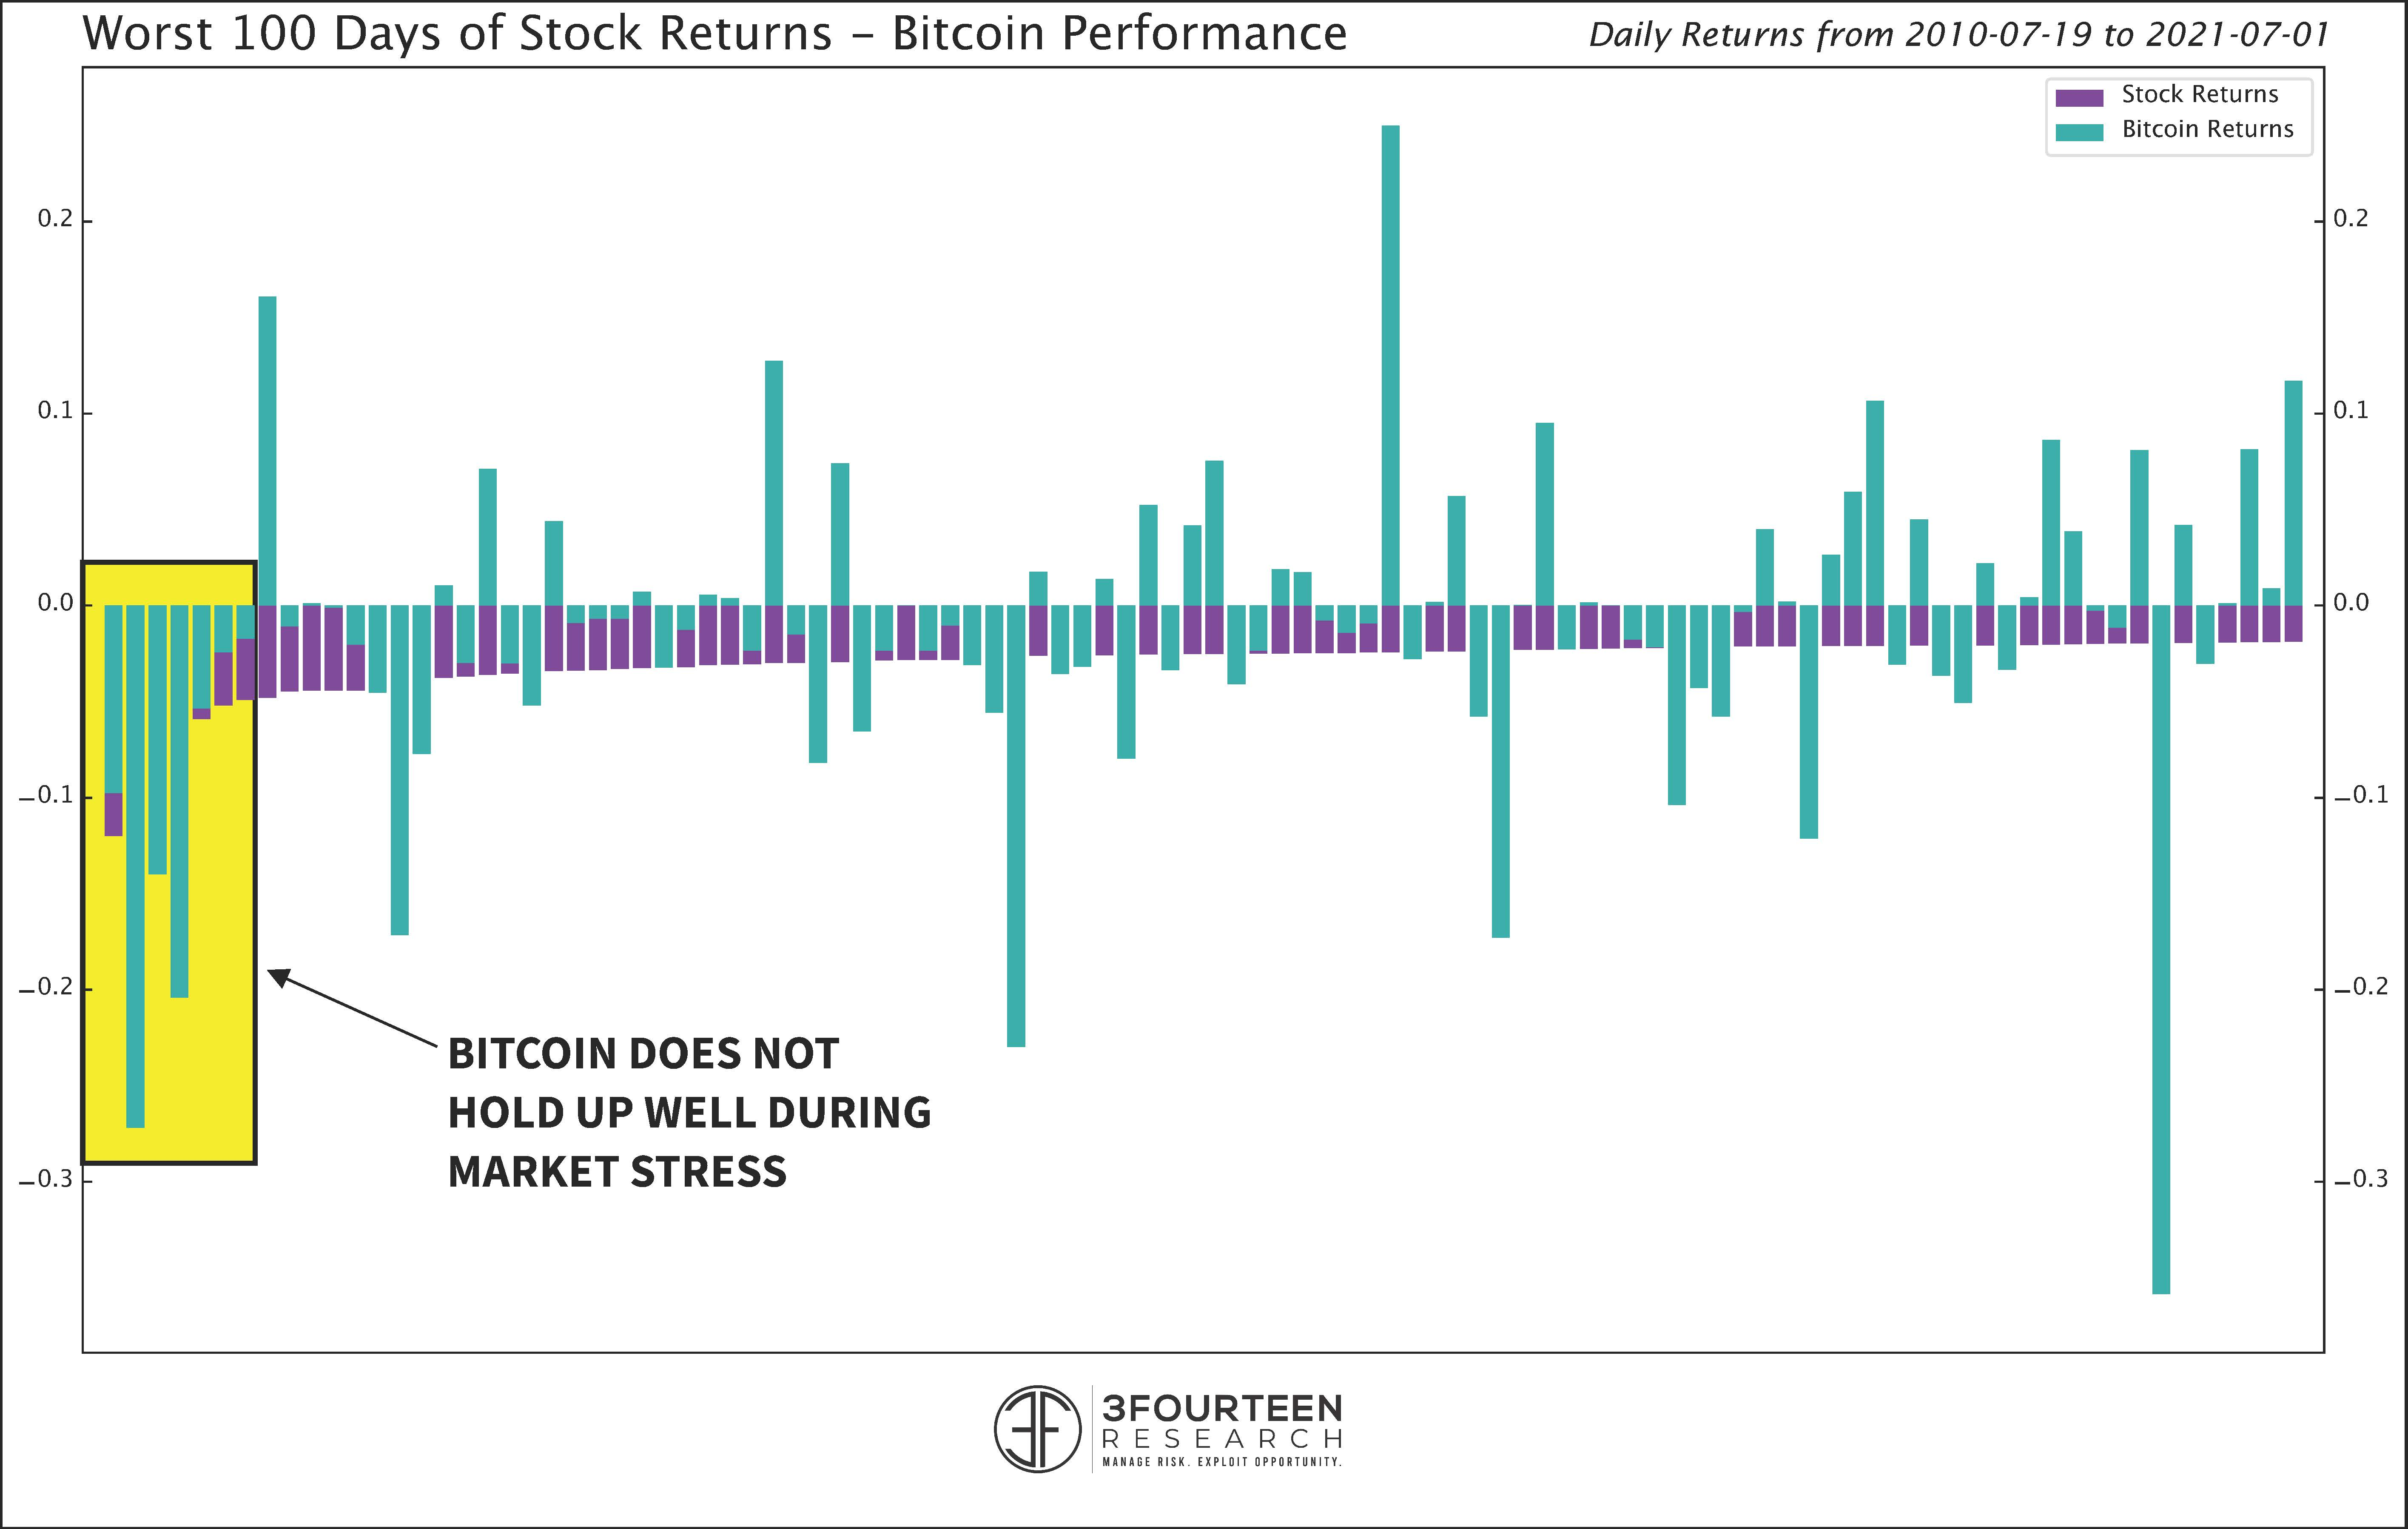 Bitcoin Performance on Worst 100 Days of Stock Return